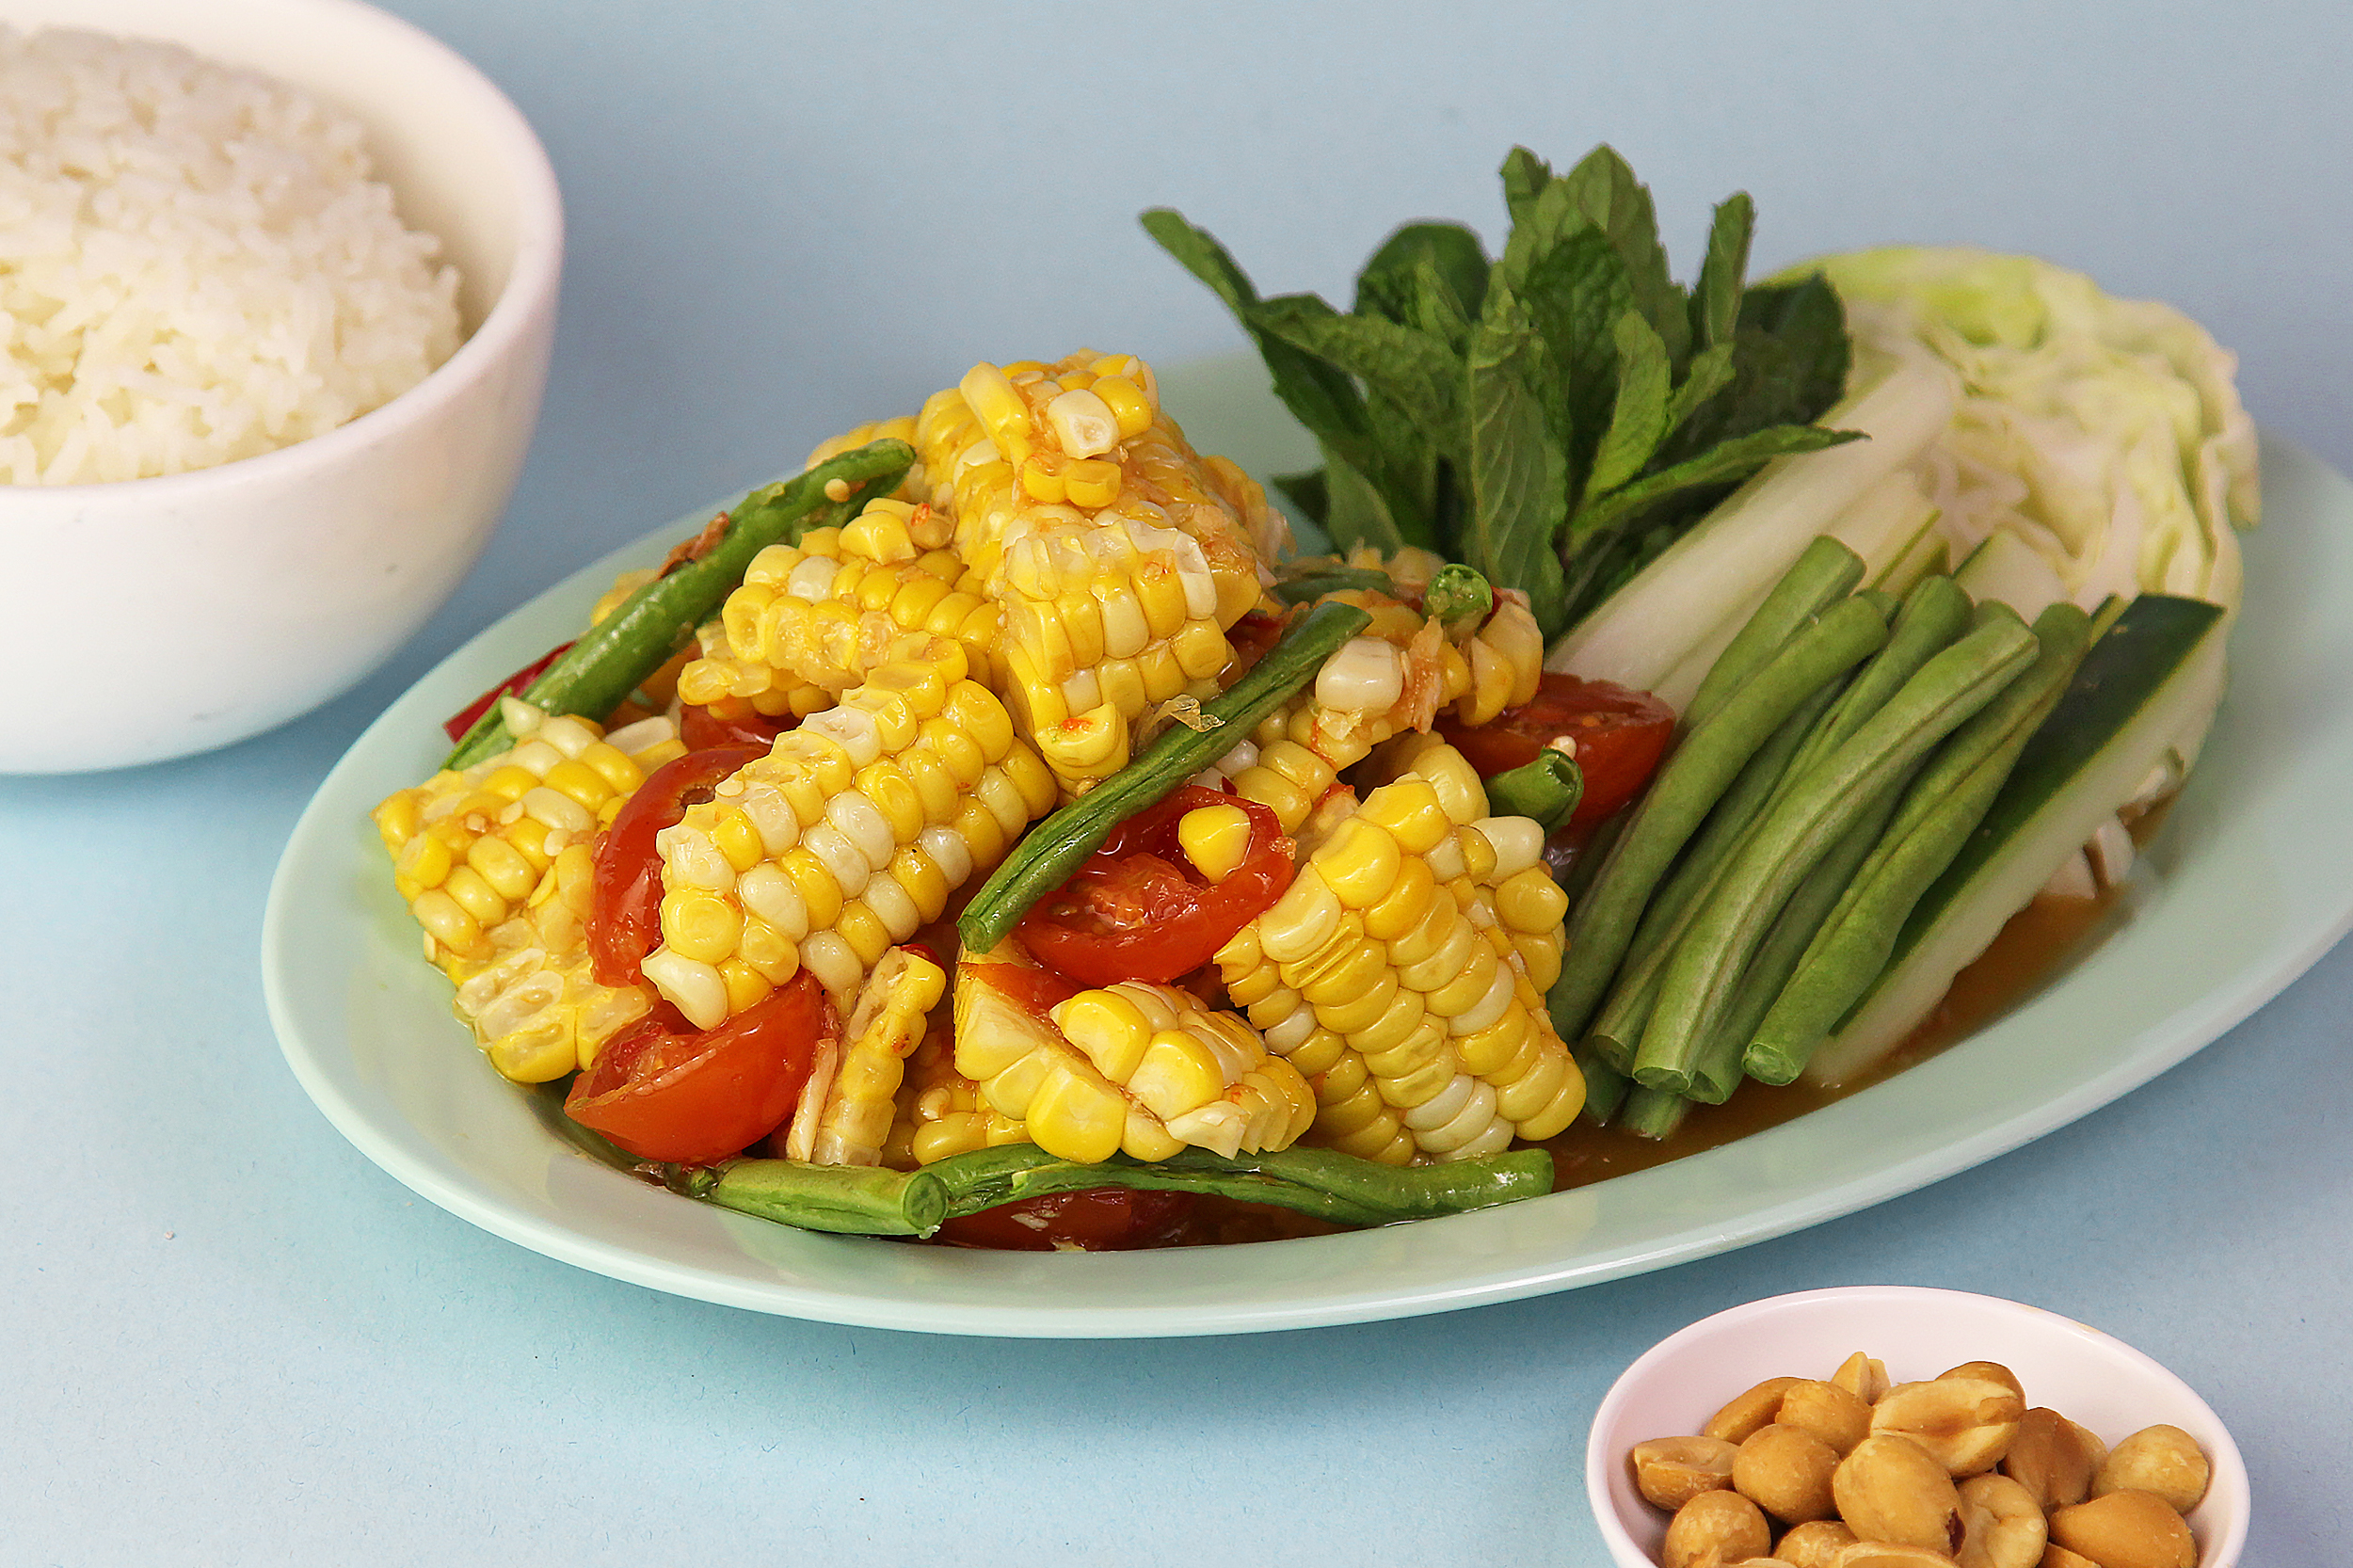 CORN SALAD 🌶 (Gluten-Free)   Steamed corn, long bean, cherry tomatoes, garlic, Thai bird's eye chili, peanuts  11